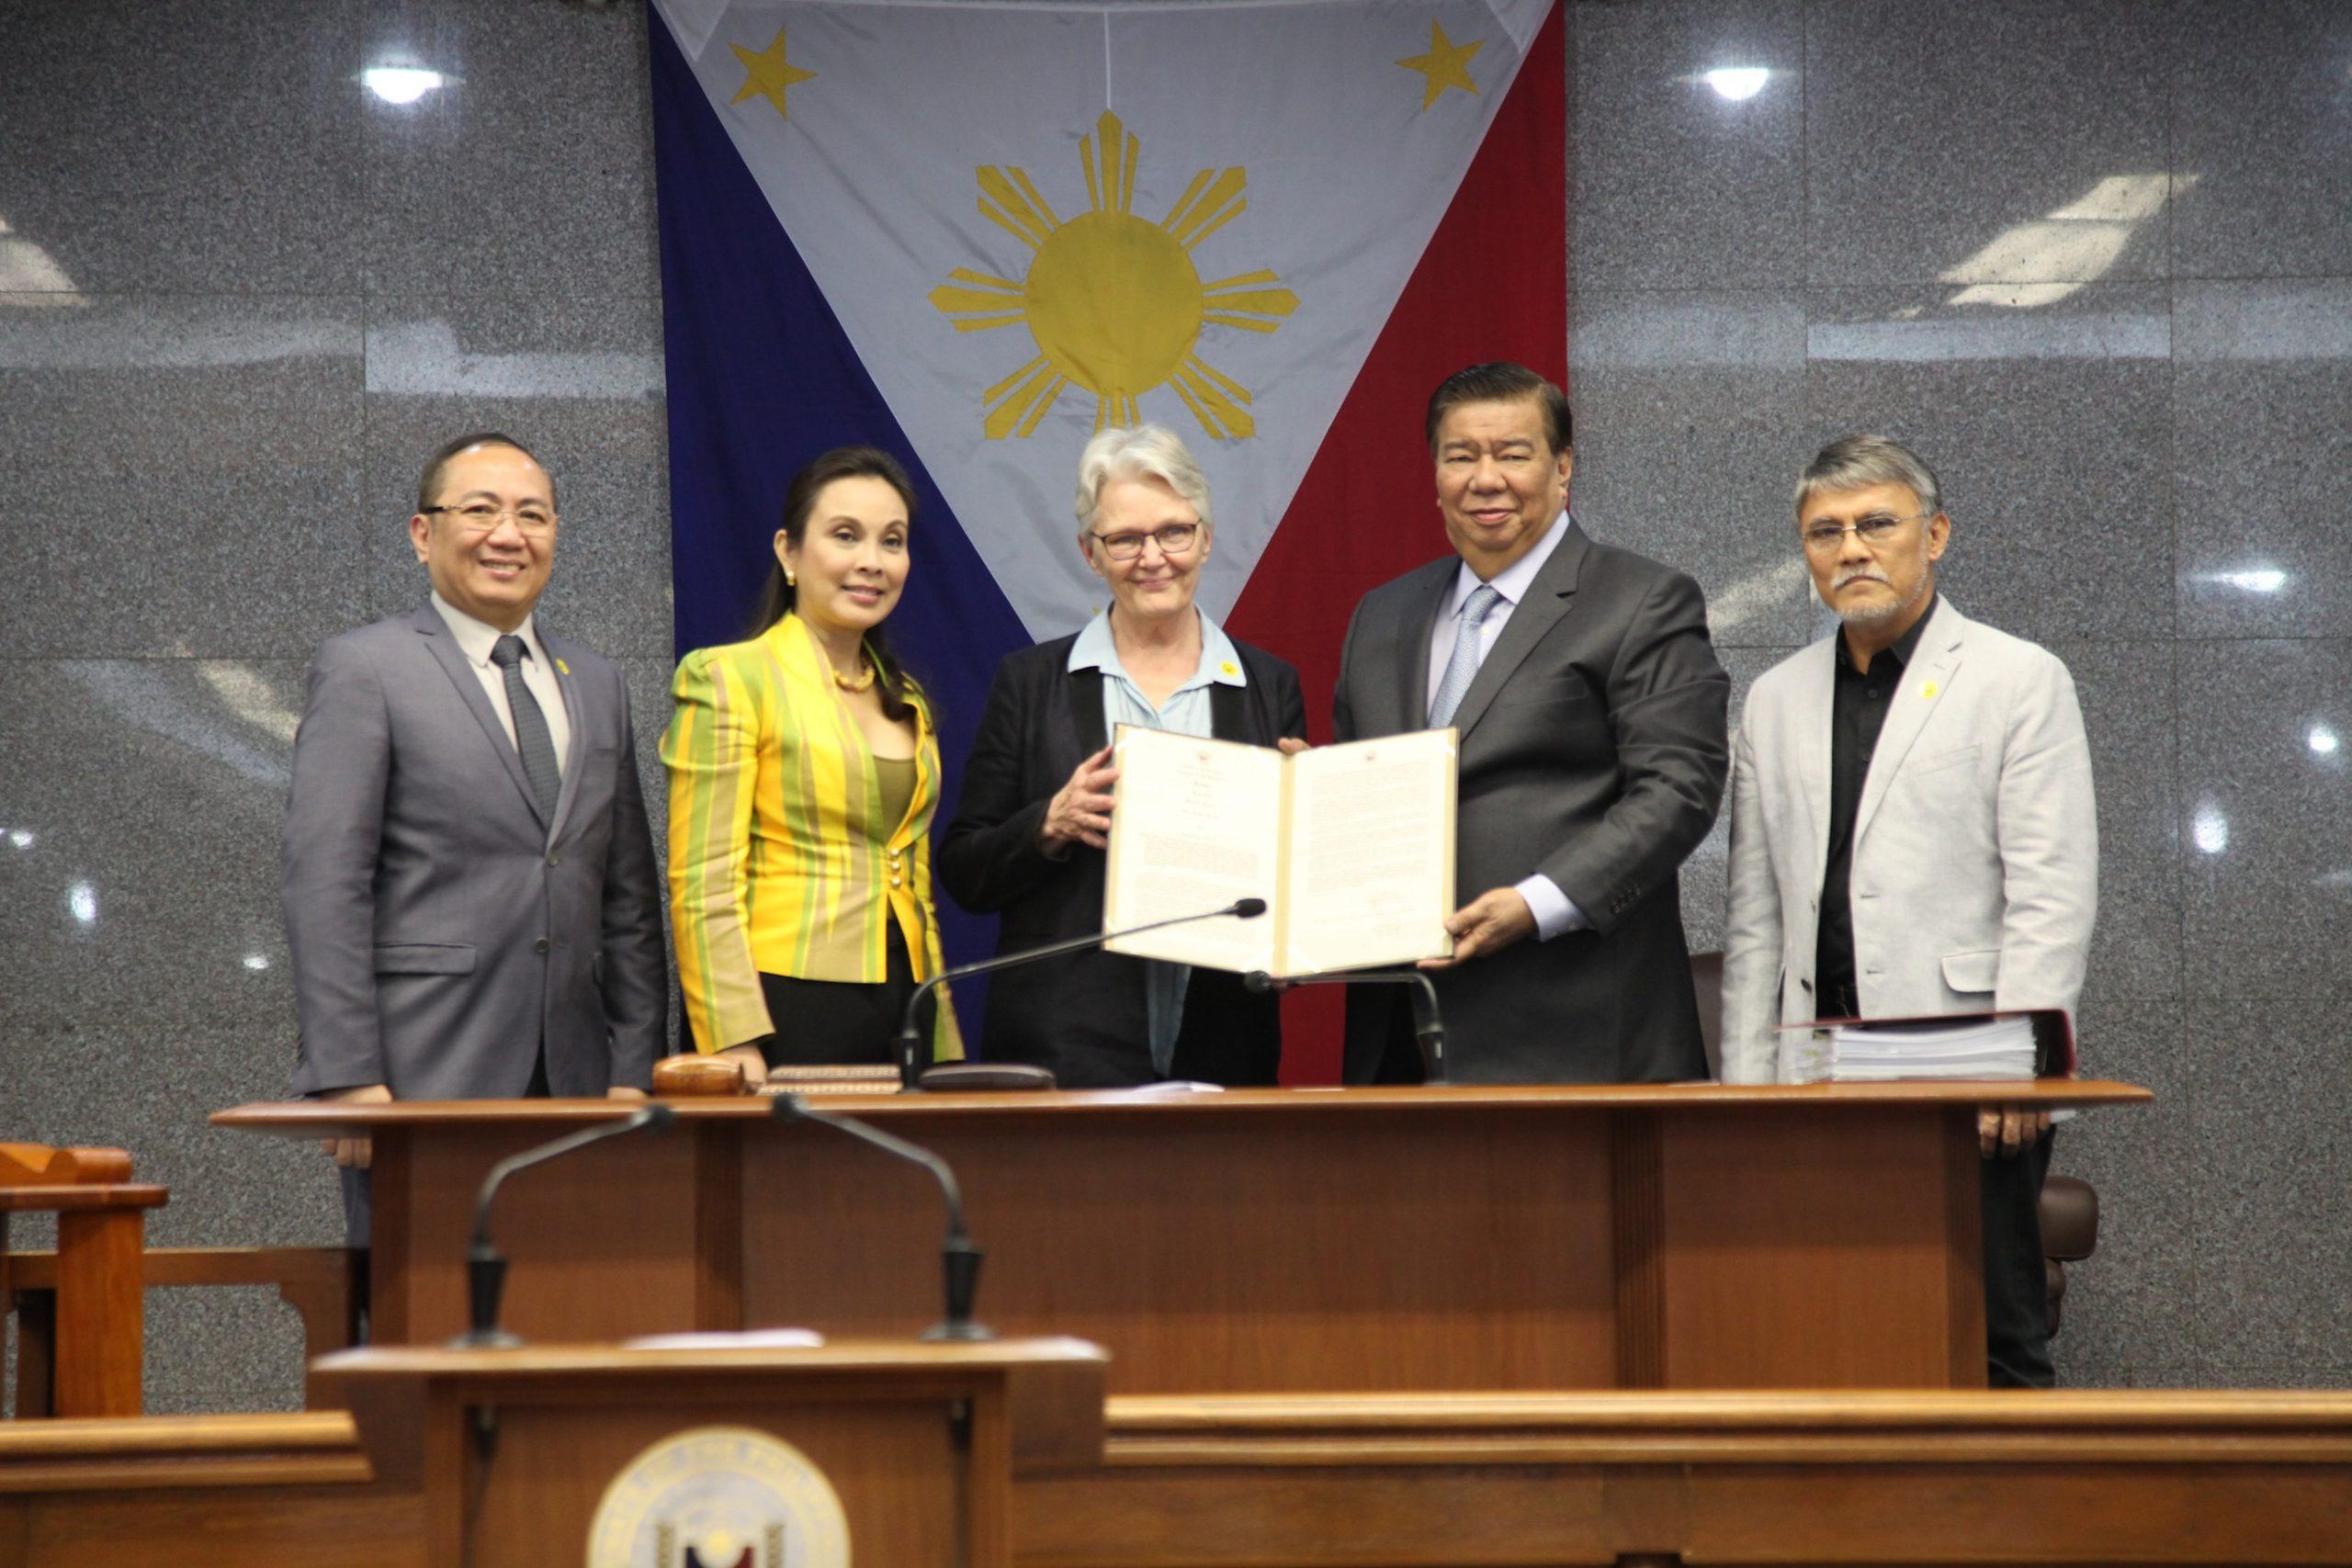 Senate Commends Former UNISDR Head, Ms. Margareta Wahlstrom